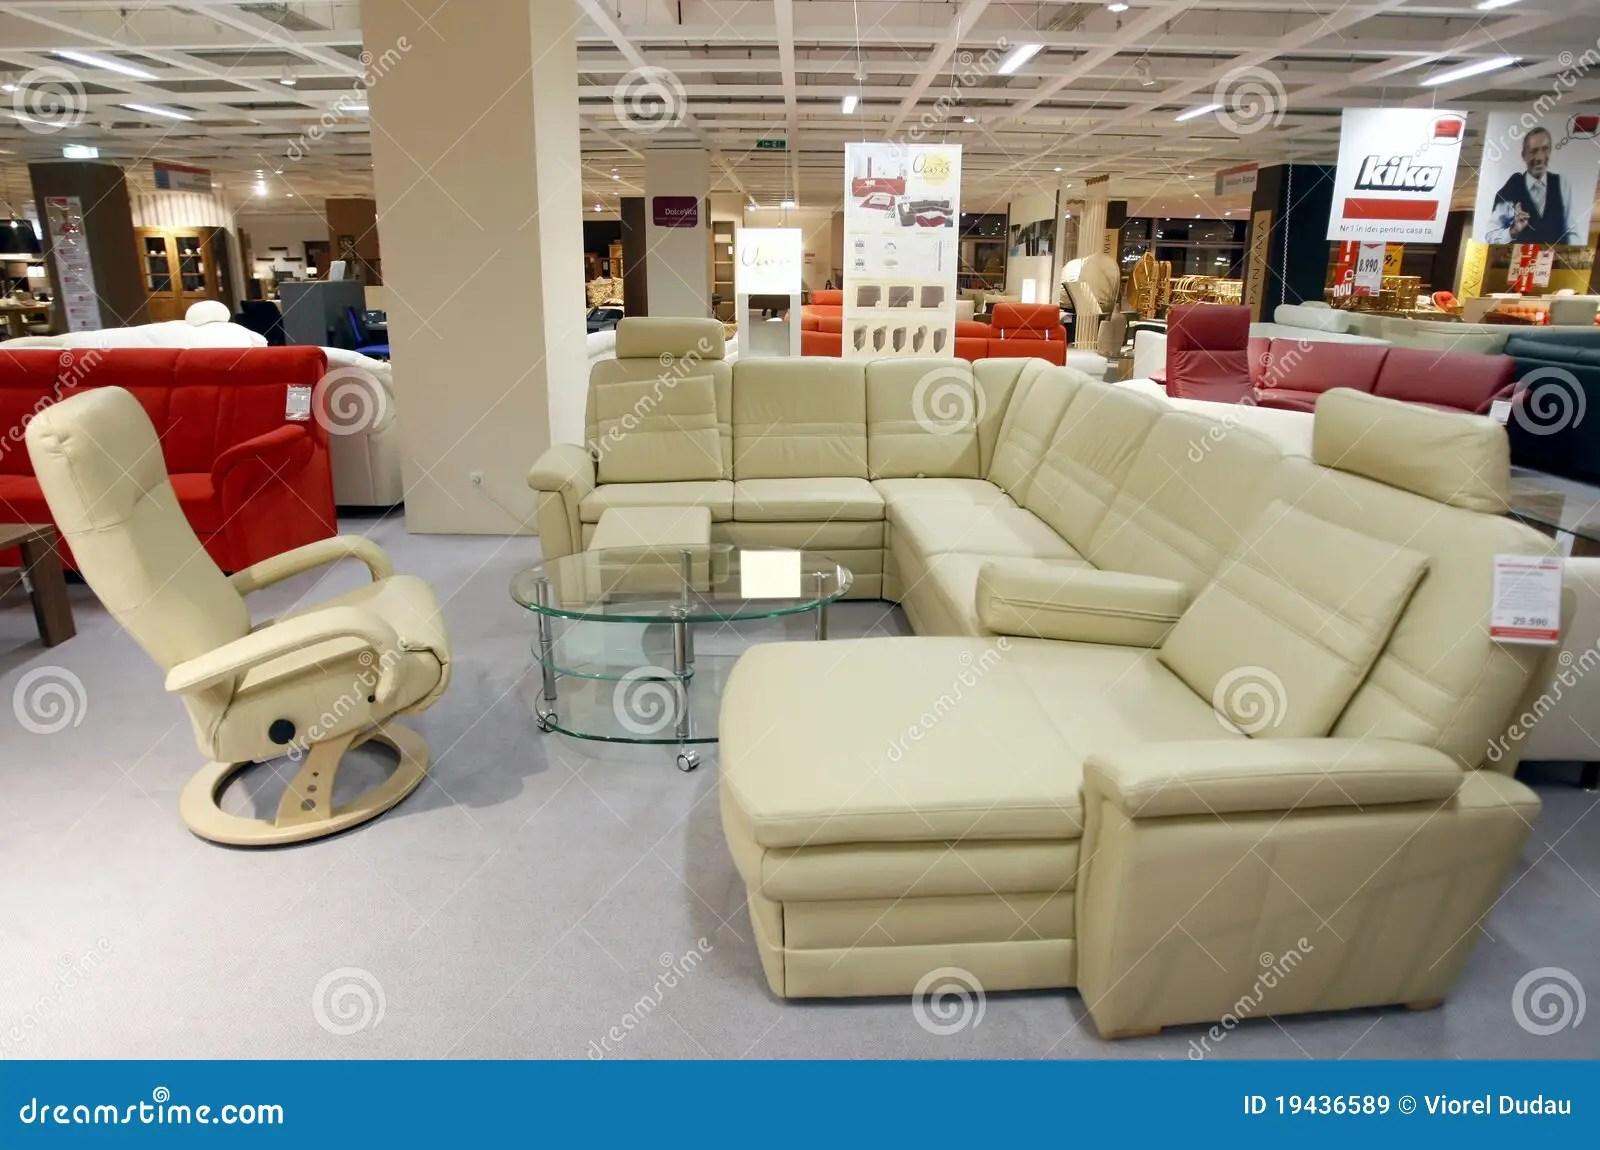 Couch Kika Probiere Gratis Santa Fe Sofa 2 Sitzig 2200 Von Kika